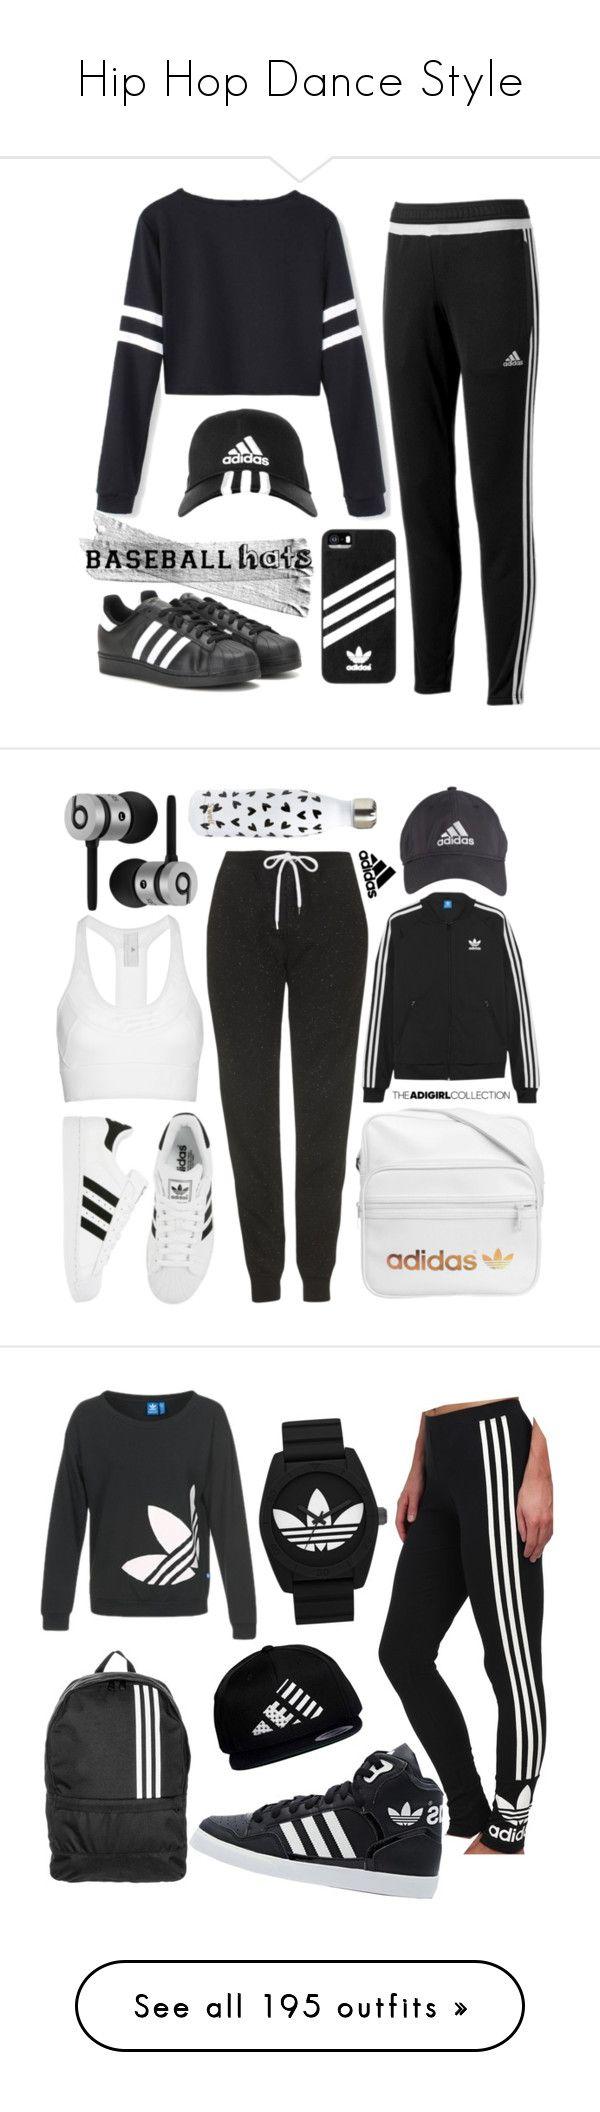 Hip hop outfits, Dance fashion